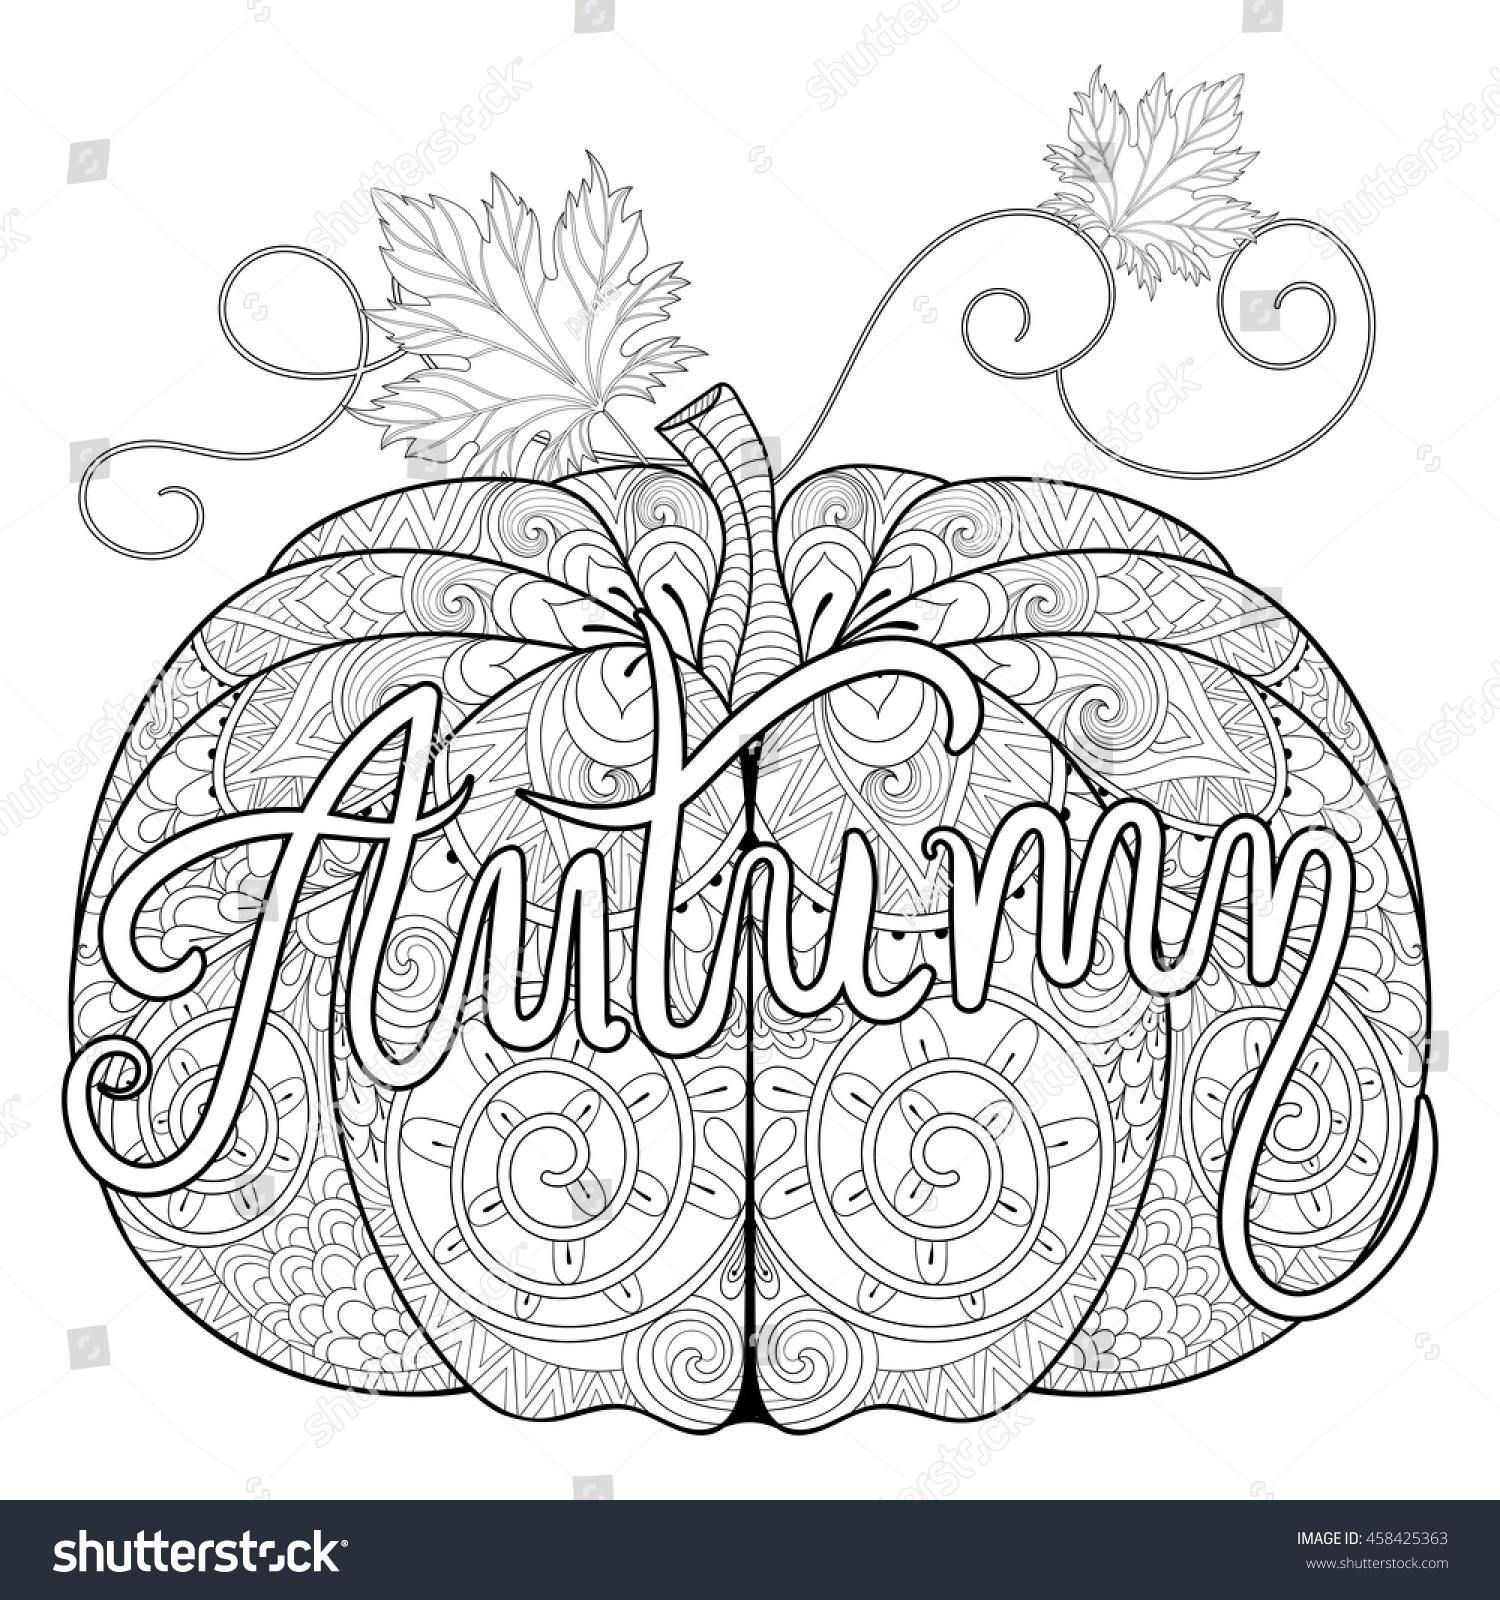 Zentangle Stylized Pumpkin Autumn Typographic Thanksgiving Stock